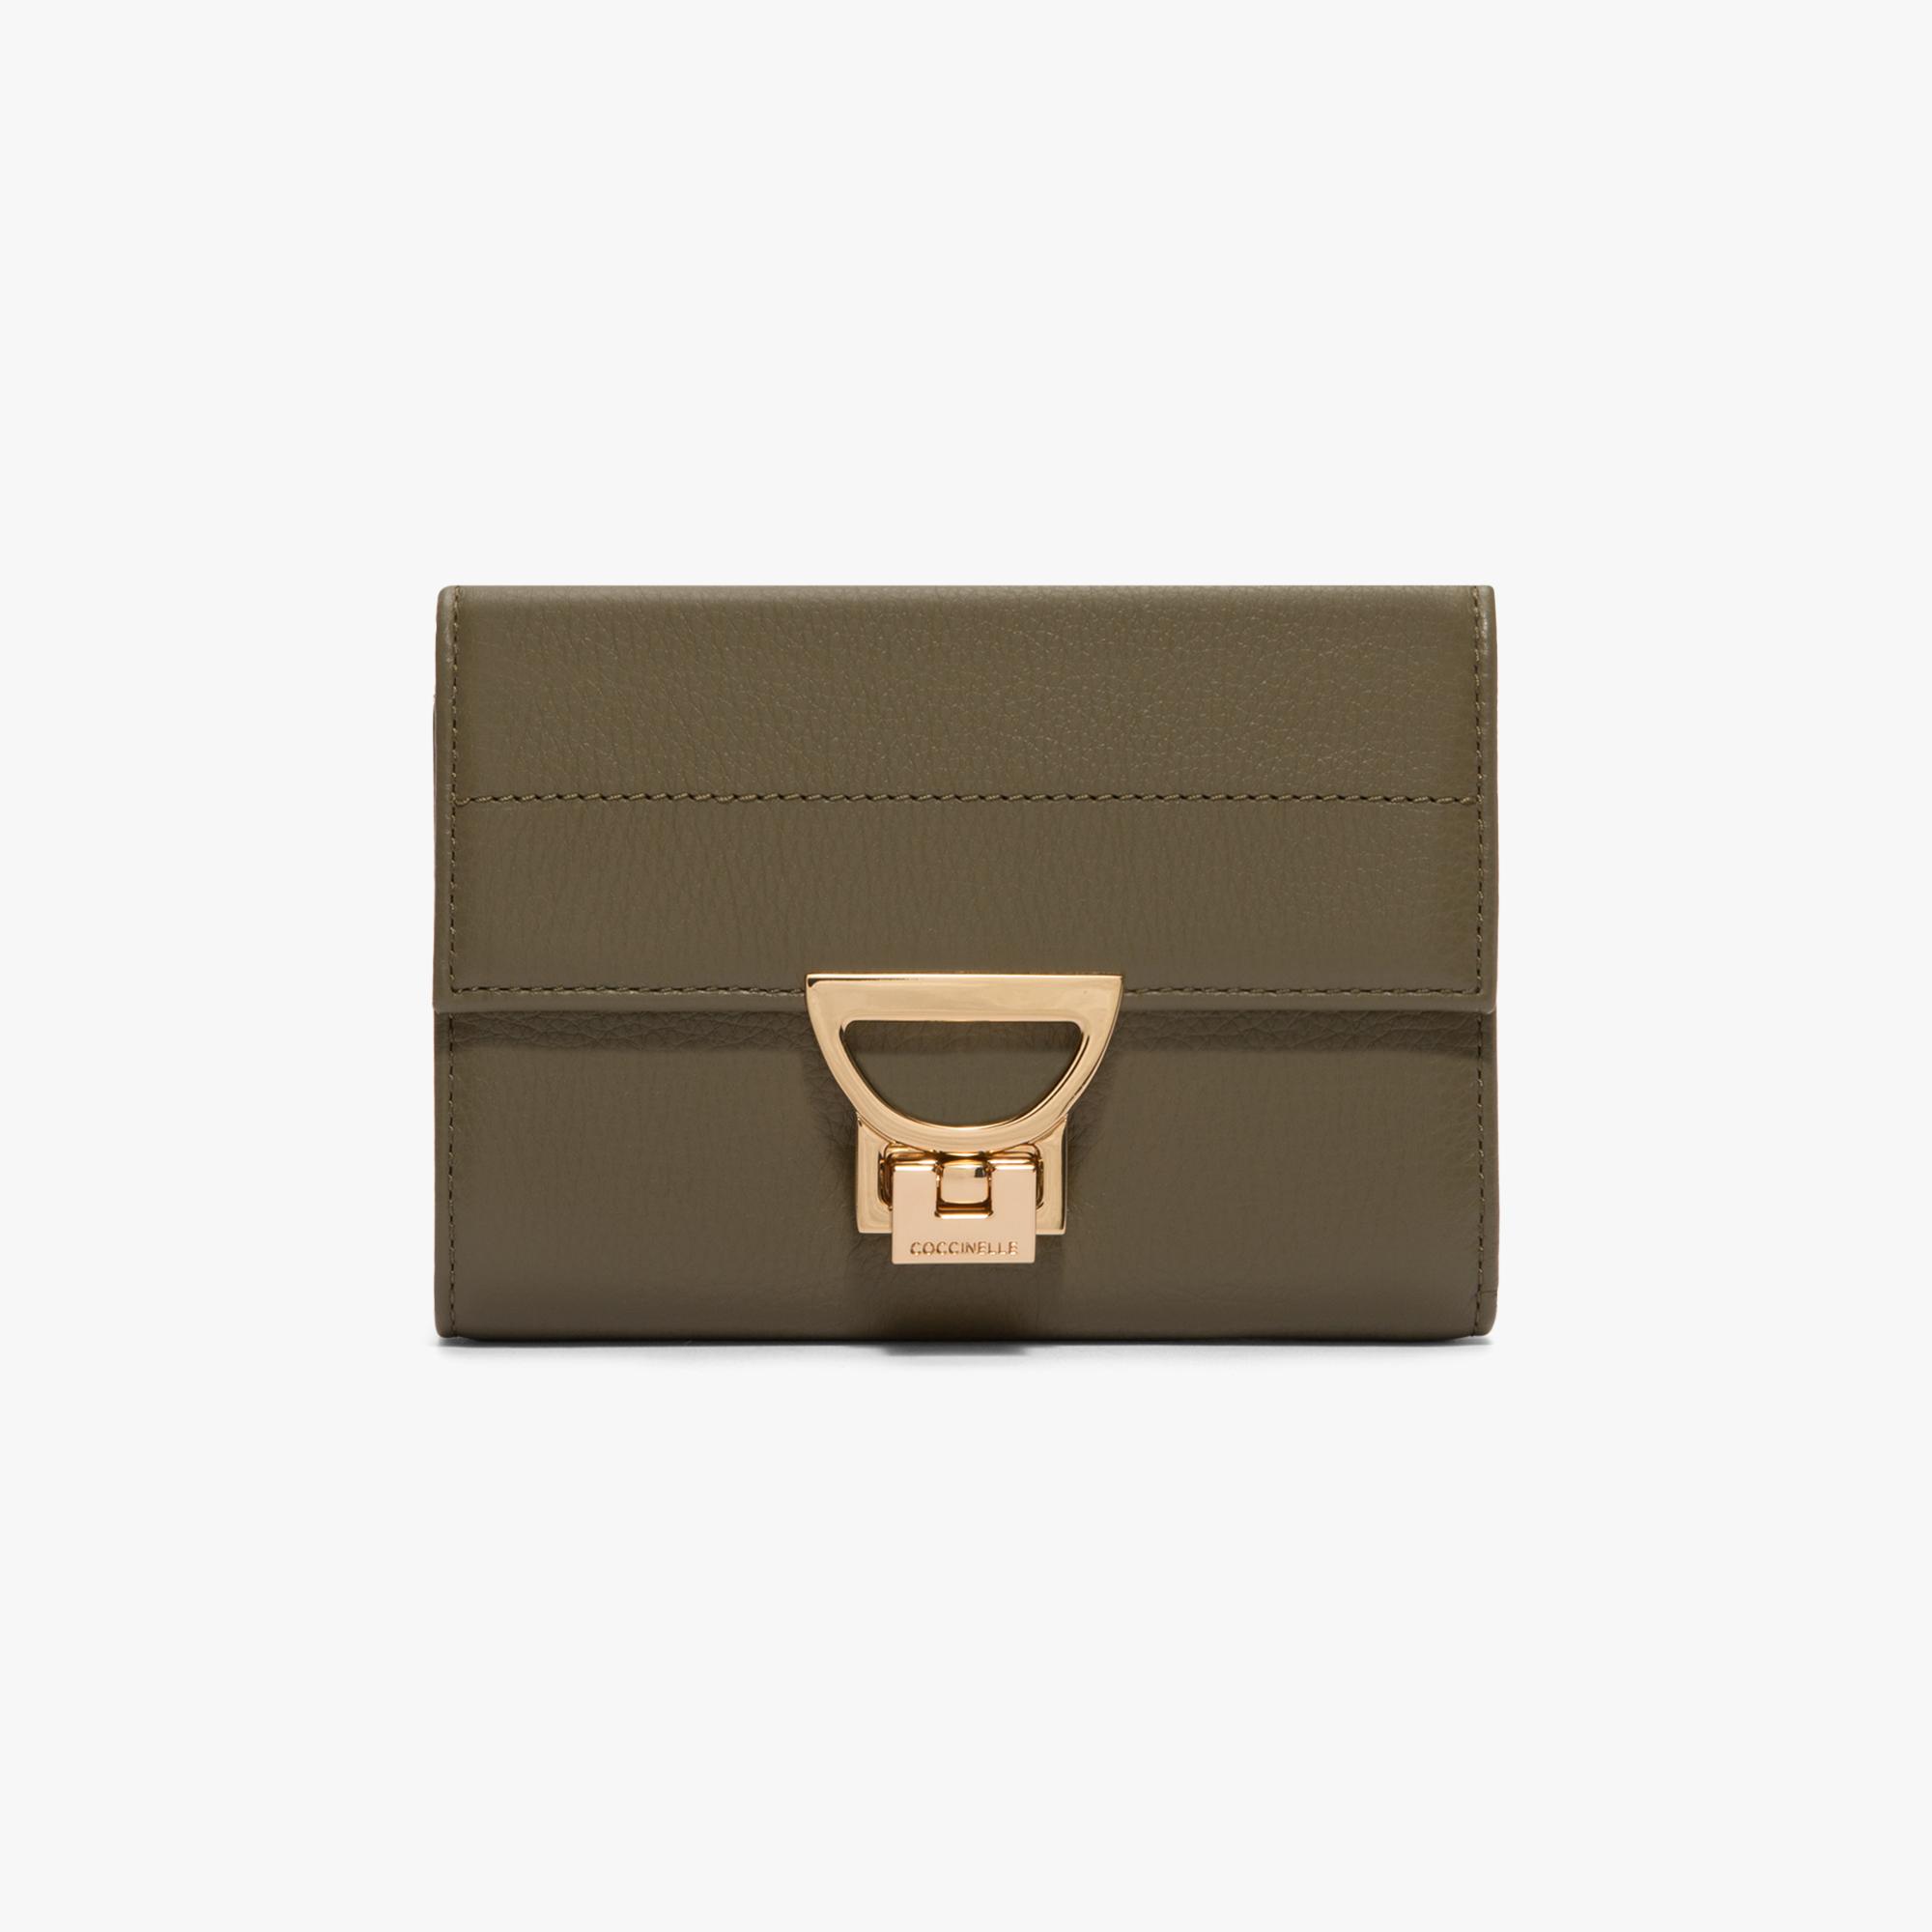 Arlettis Leather wallet